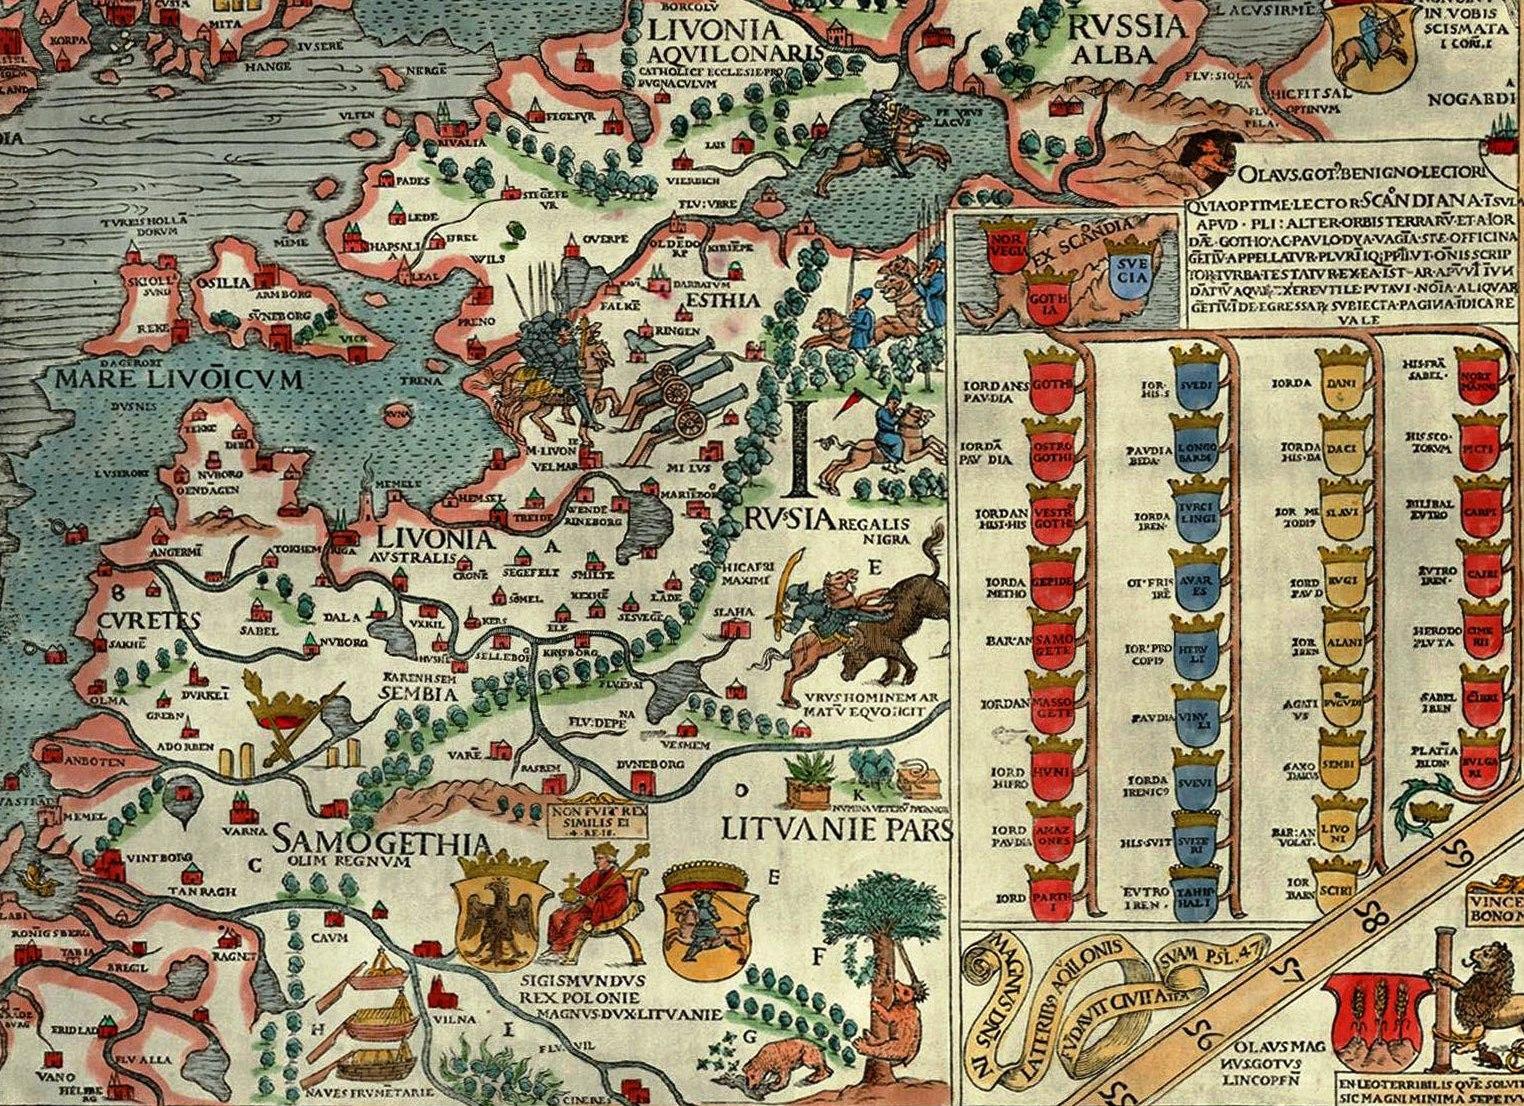 C:\Users\PC\Desktop\zemaitijos herbui\1539-Samogethia-and-Lituania.jpg